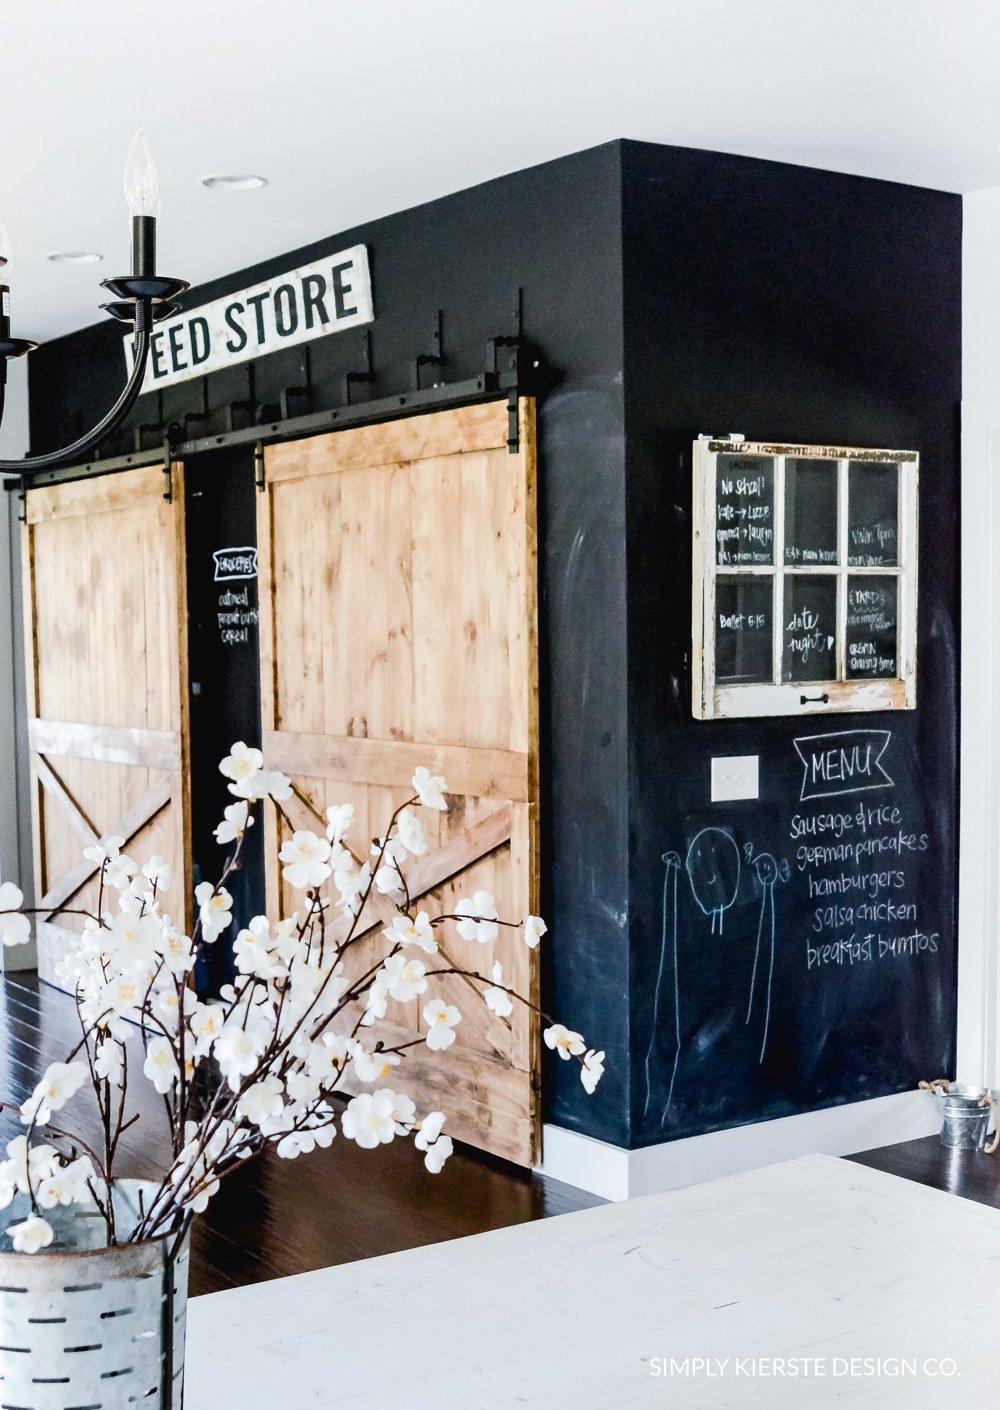 Why I Love My Chalkboard Wall | Simply Kierste Design Co.